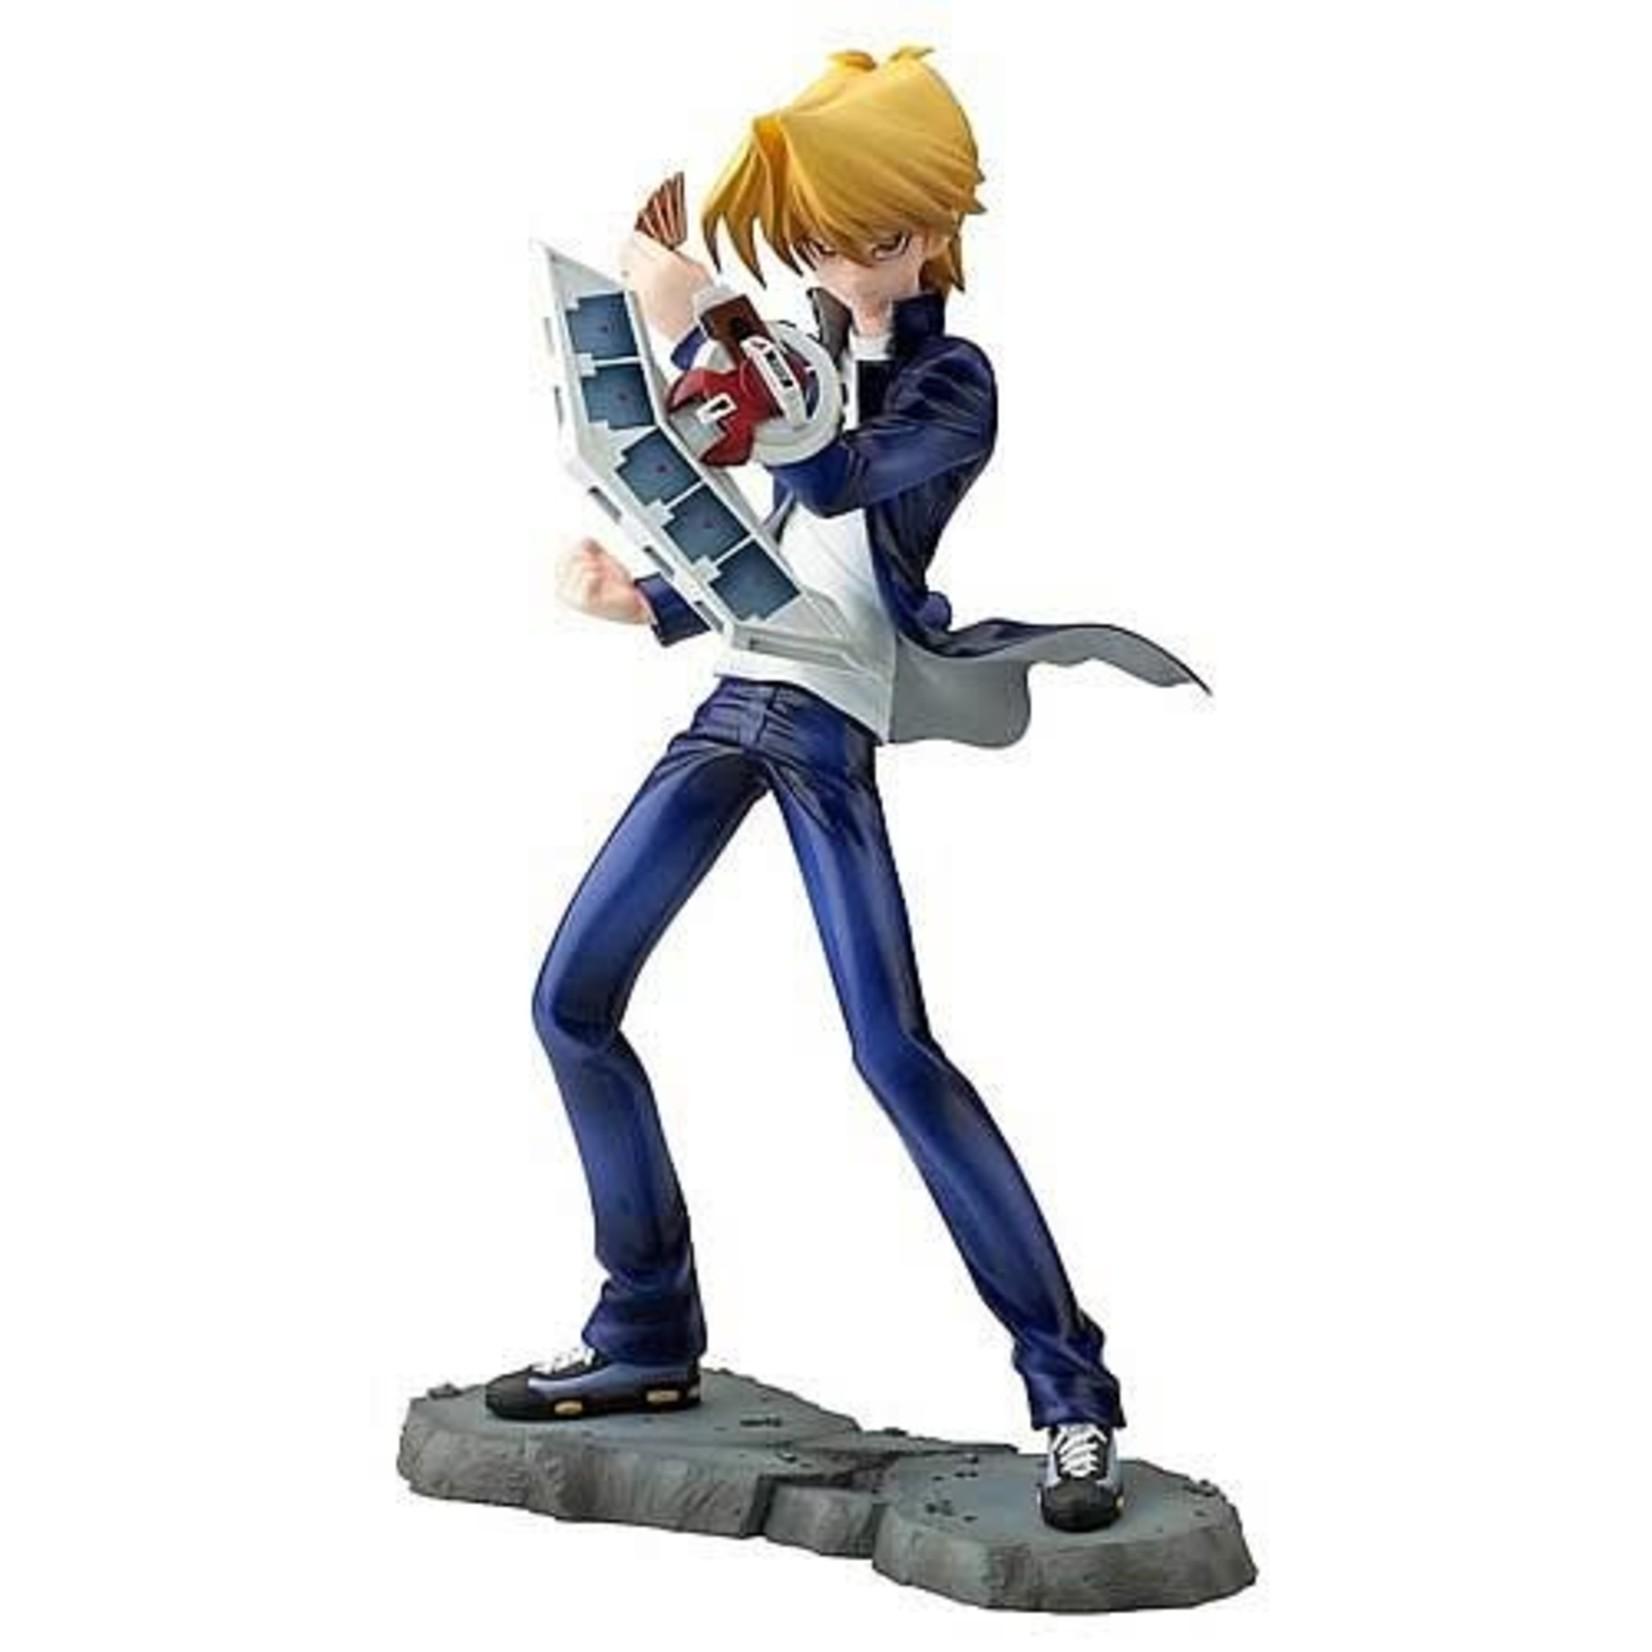 Kotobukiya Yu-Gi-Oh! Joey Wheeler ARTFX J Statue - ReRun